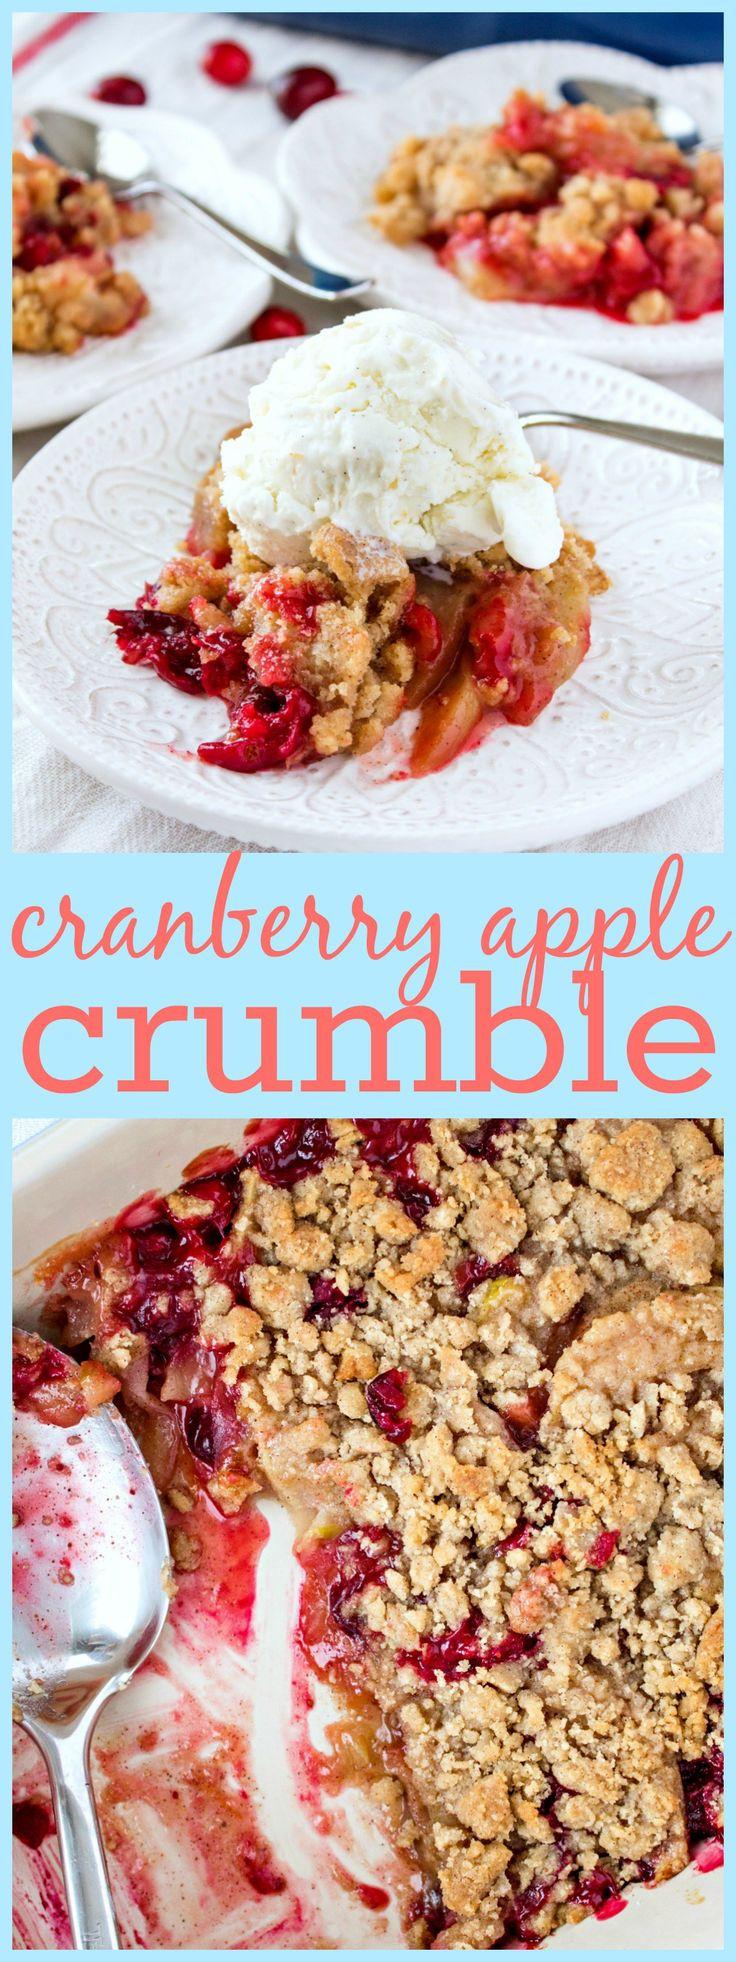 cranberry-apple-crumble